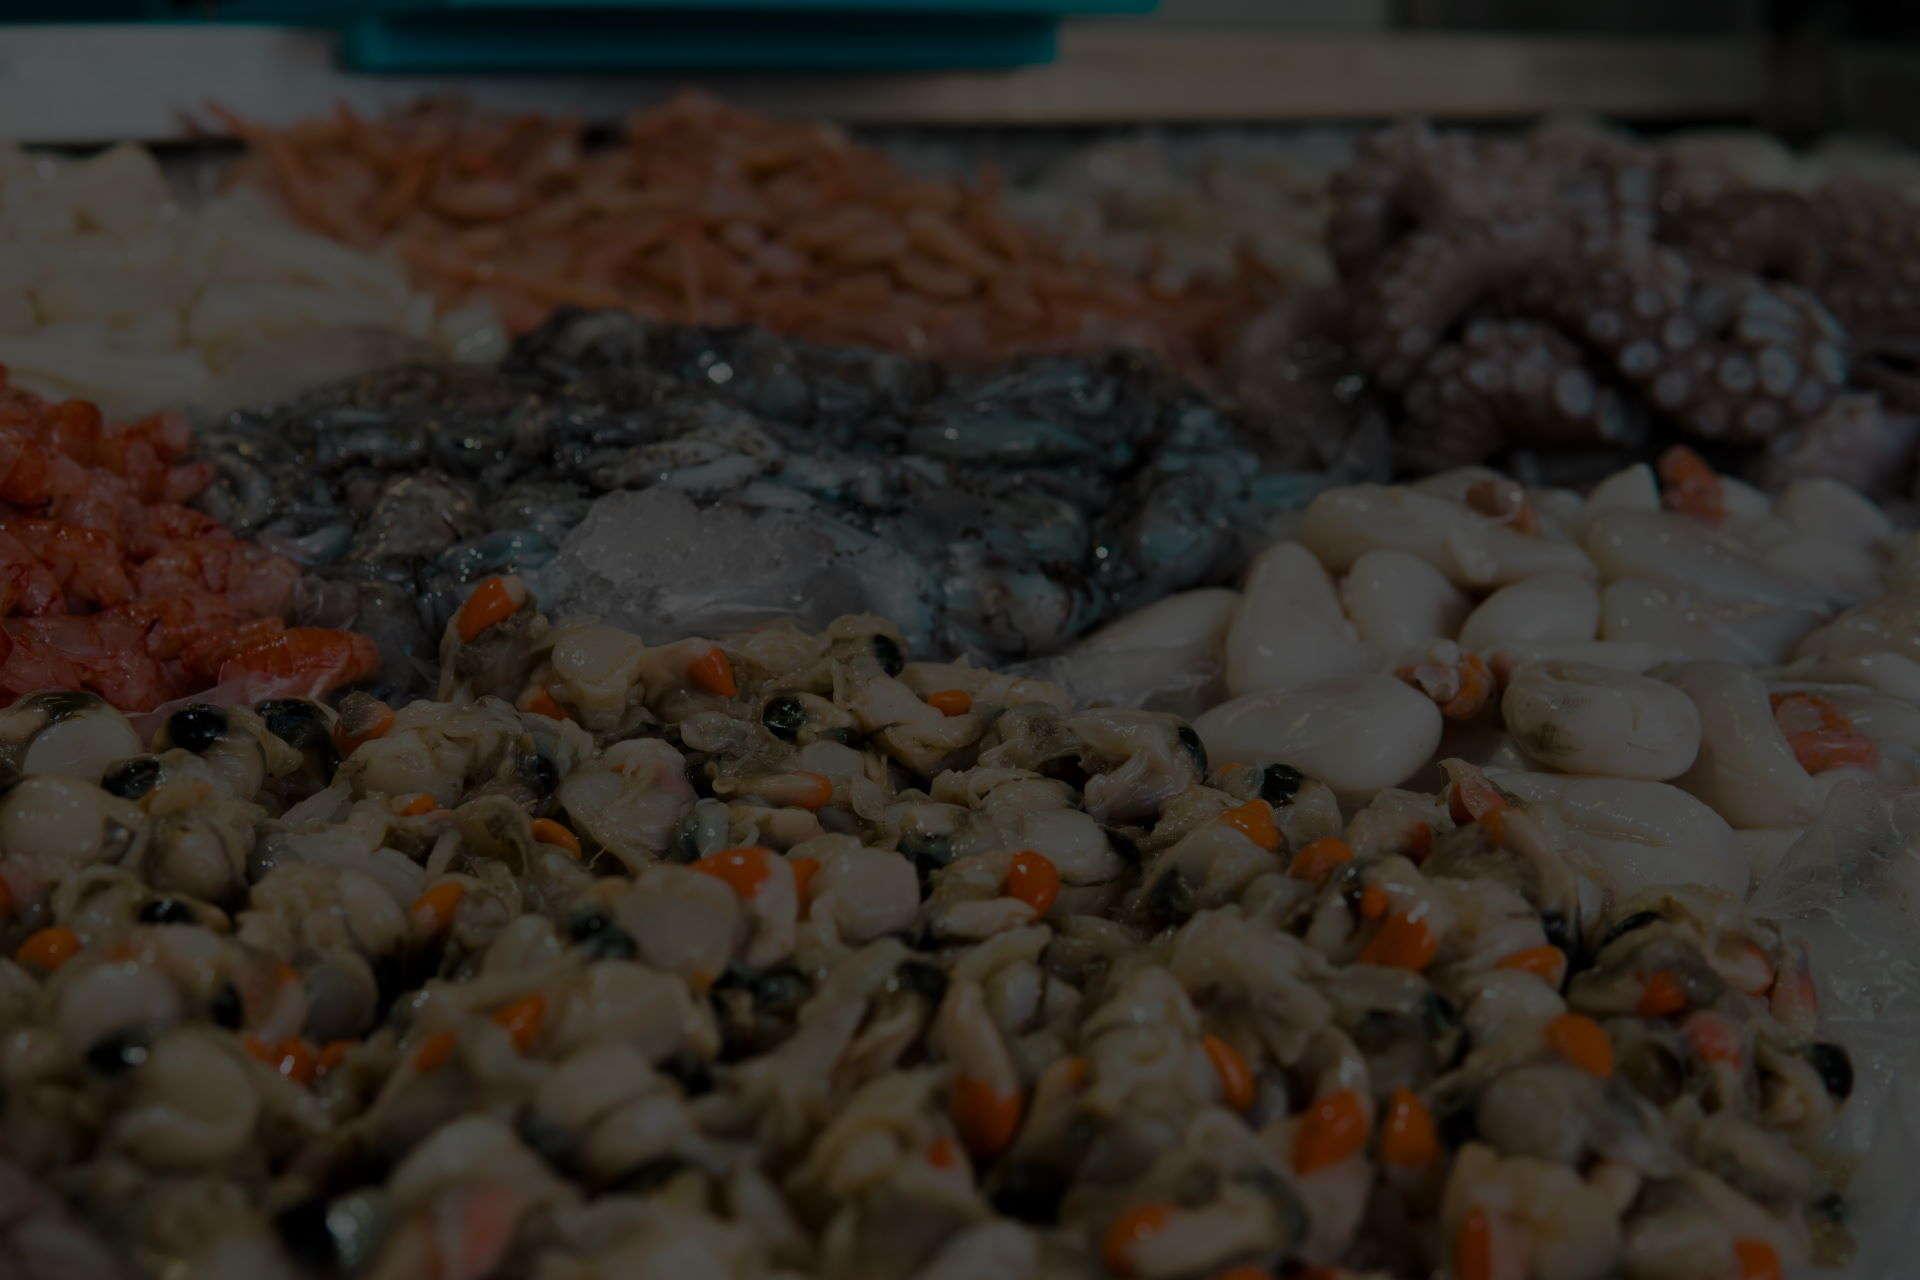 Piave Pesca banco pesce slider home (Compressed)